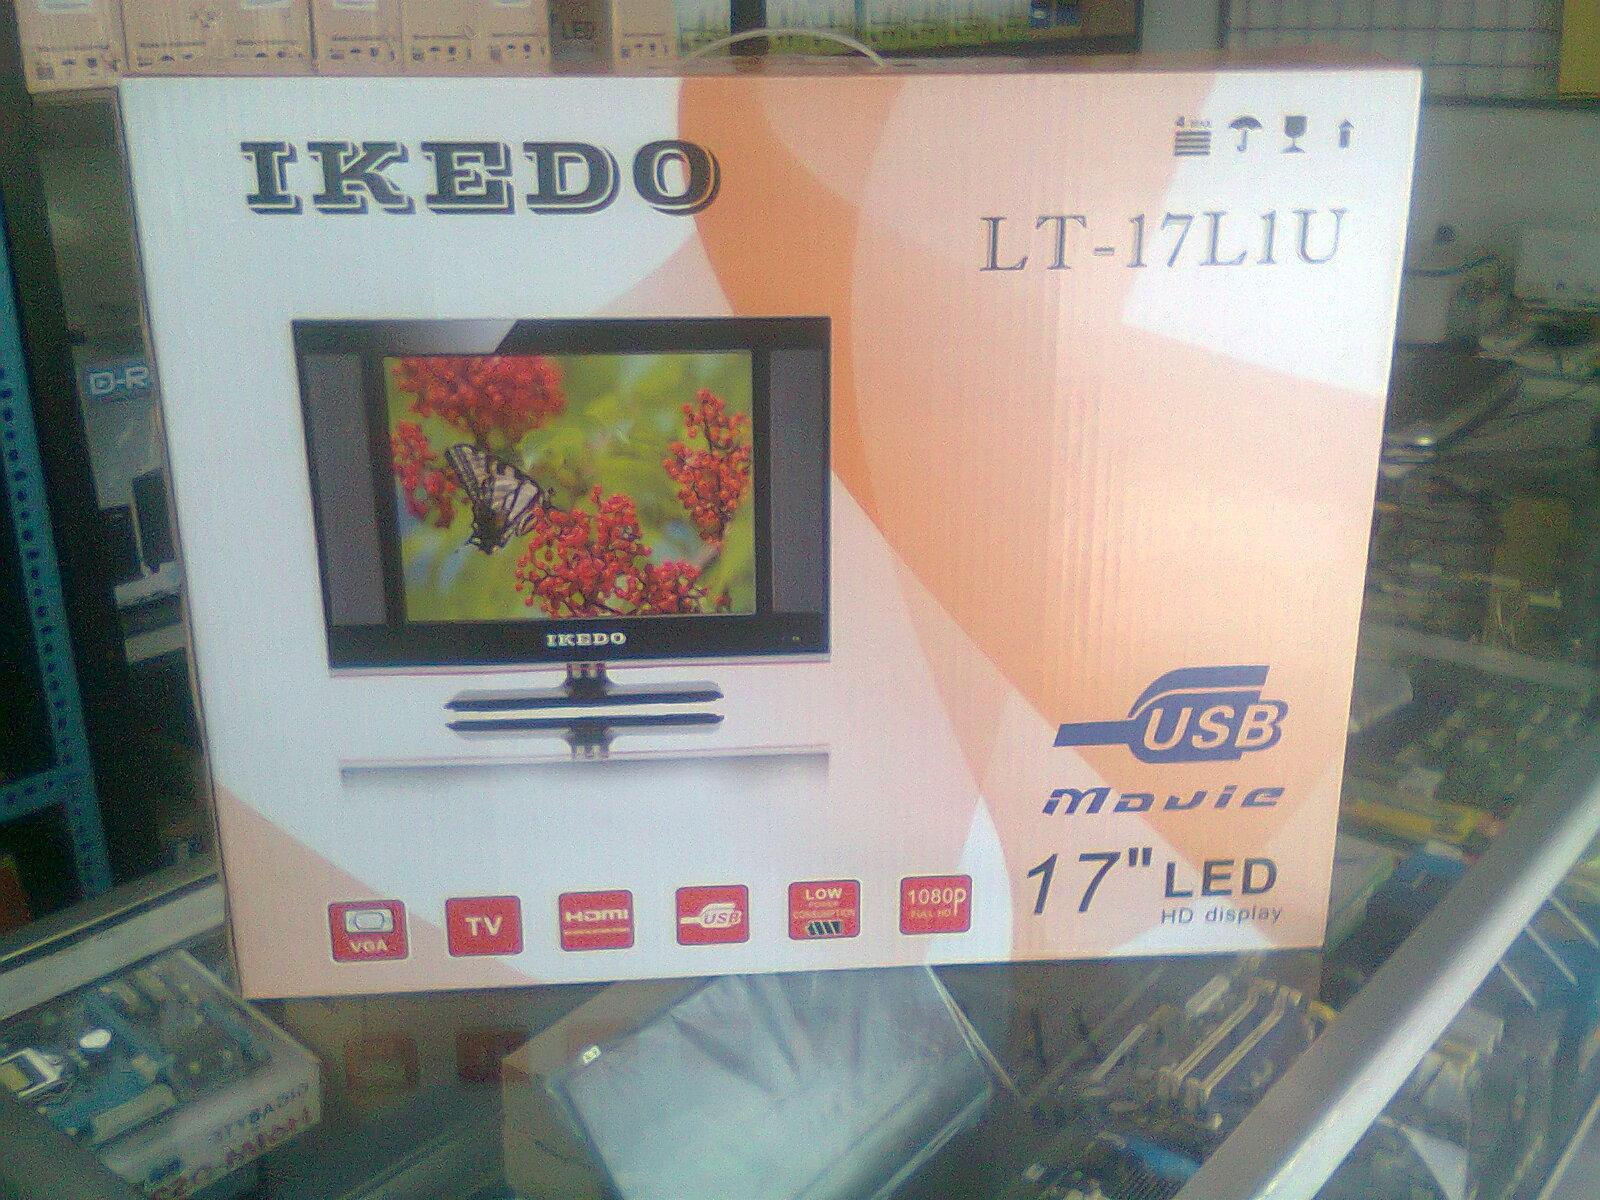 Ikedo Tv Monitor Led 17 Inch Lt 17l2 Daftar Harga Terkini Dan 24p1u1 24 Jual Ready Stok 20 Made In Indon